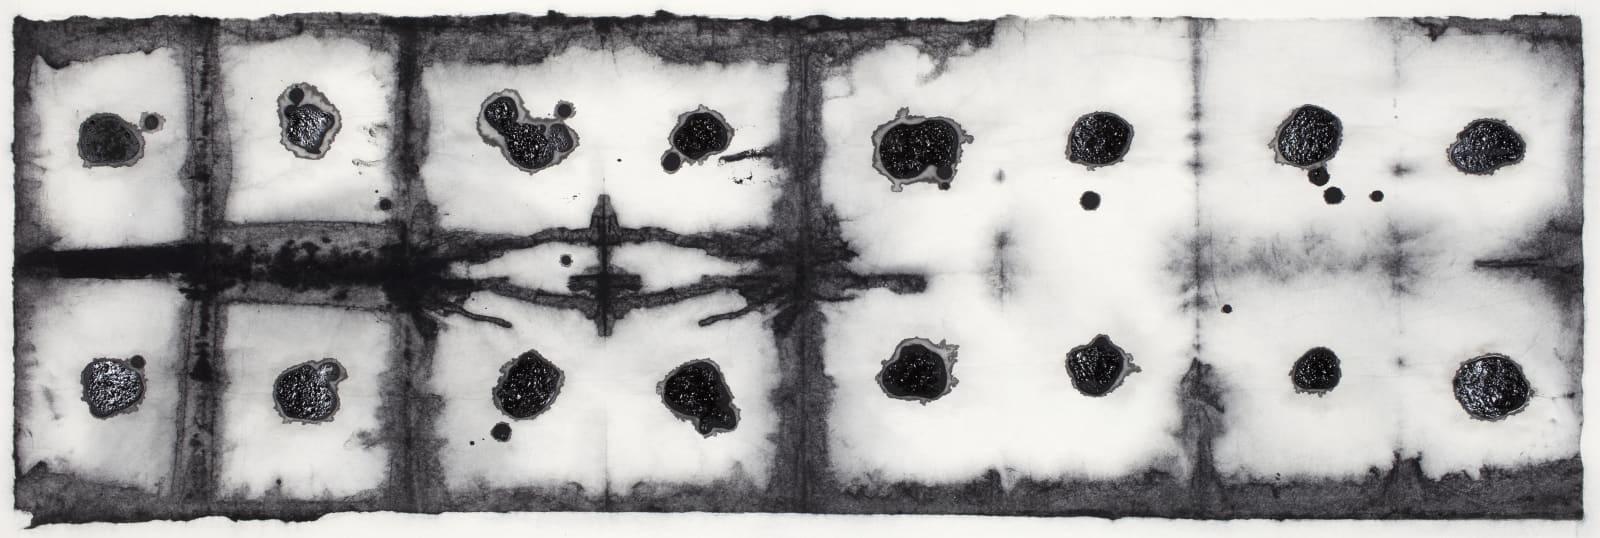 Li Gang 李綱, Elements of Ink and Wash 水墨元素 No.20120404, 2012